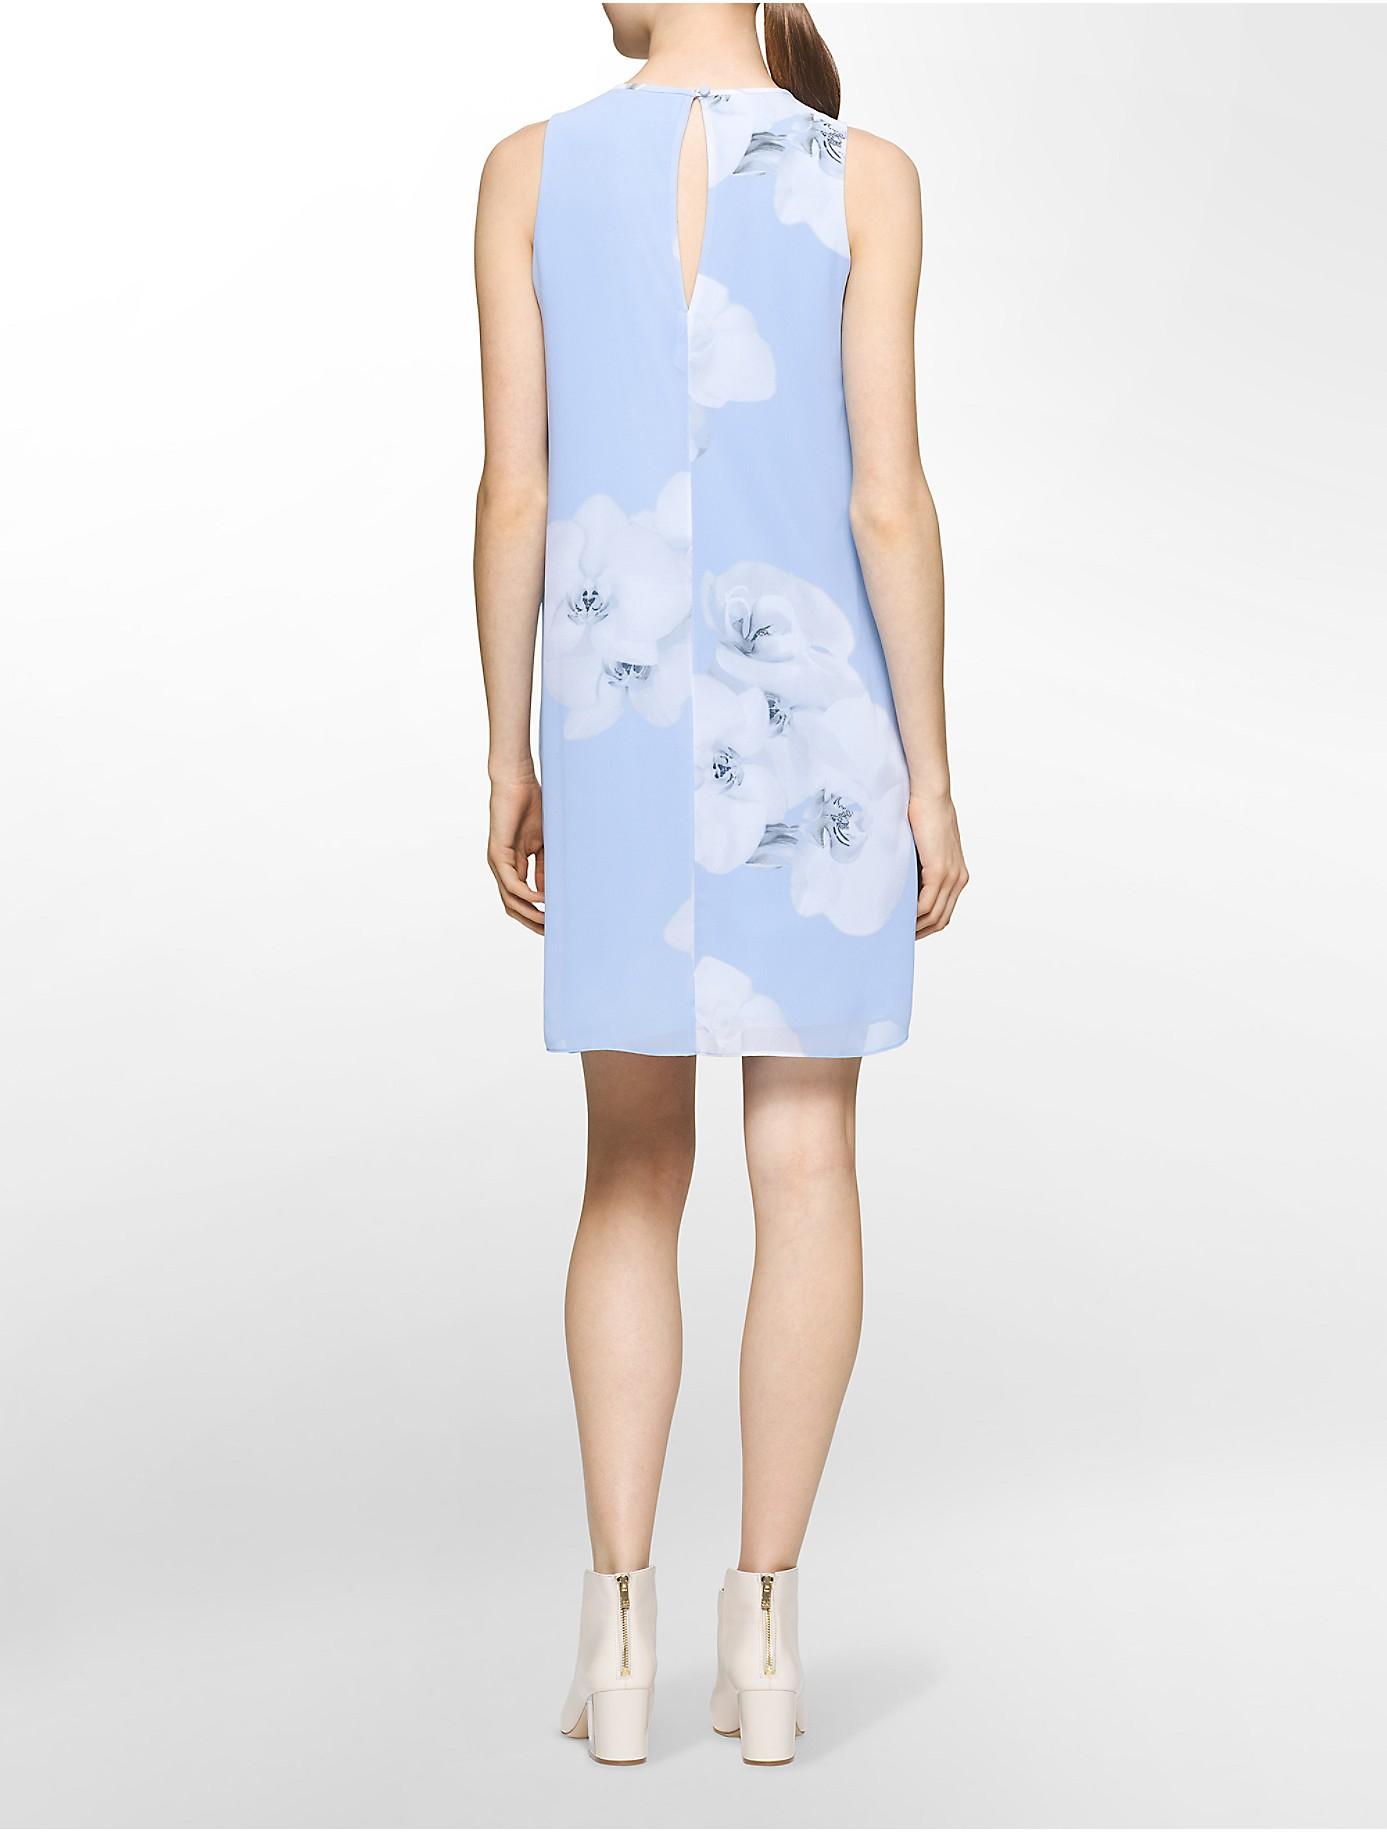 Calvin Klein Blue Chiffon Dress